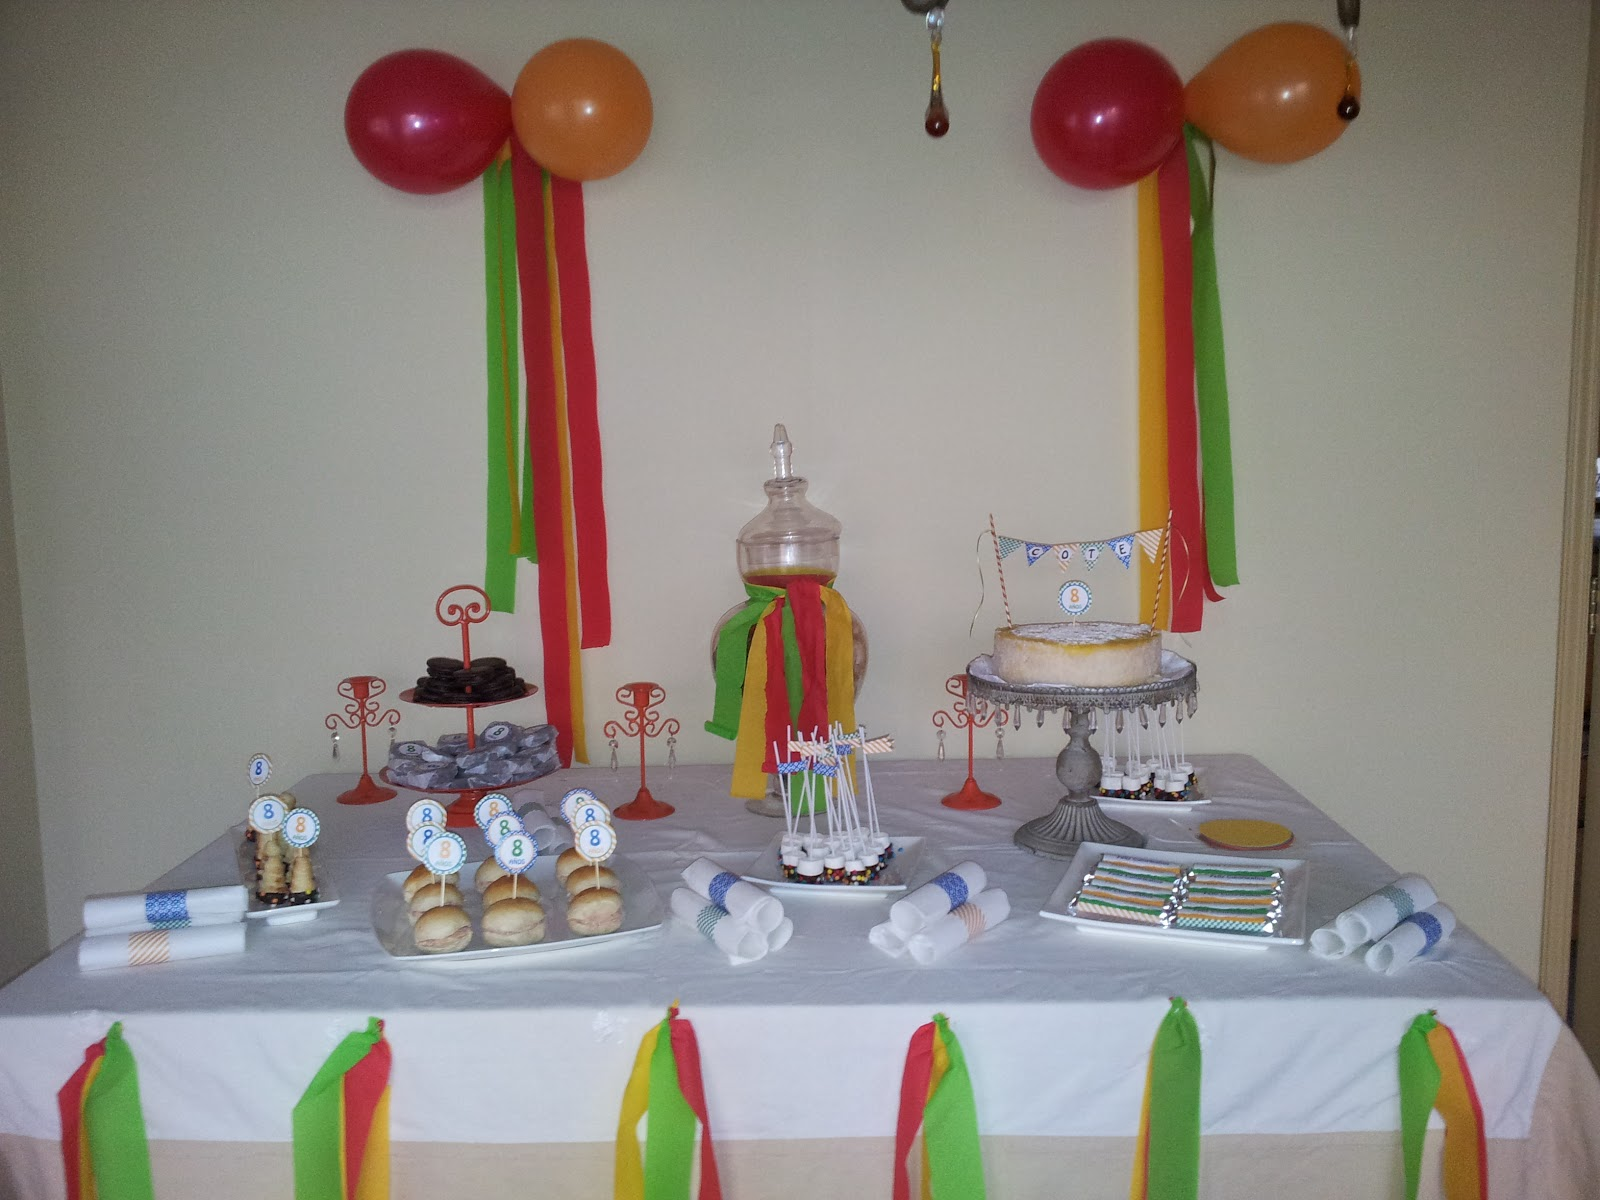 Decoracion para cumplea os de 50 a os quotes links - Fiesta cumpleanos 8 anos ...